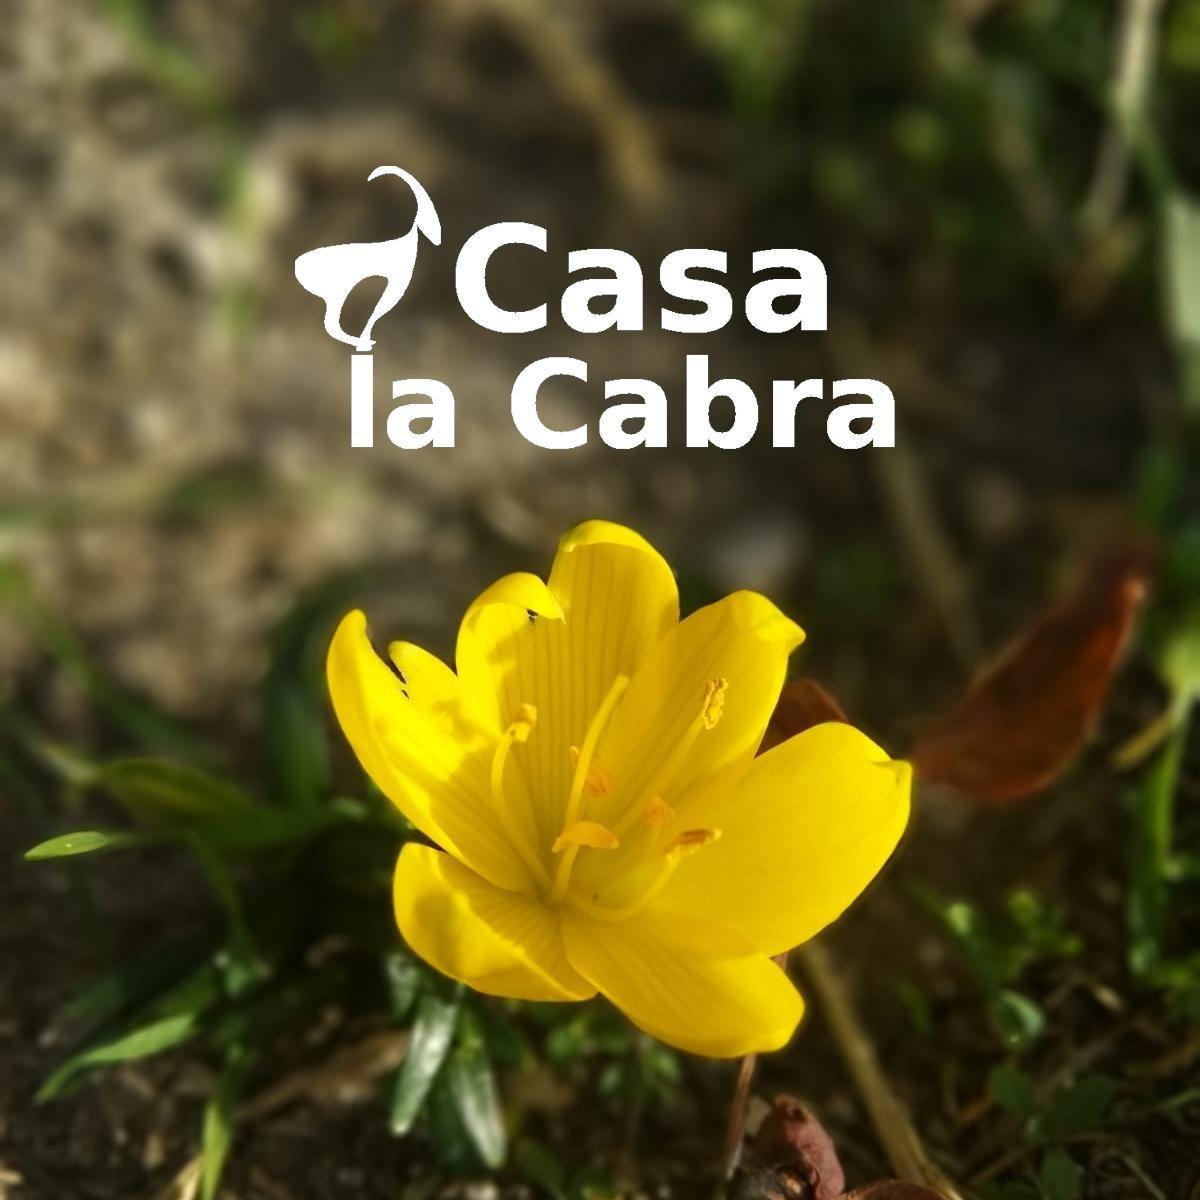 Las flores amarillas de Sternbergia https://t.co/To61bsXEHA  #CasaLaCabra #Moclín #GranadaParadise #Granada #DreamingGranada #loves_granada #breathtaking #epicview #sun #spain #traveltospain #travelblogger #travelphotography #granadaturismo #gollizno #rutadelgollizno #moclin https://t.co/whahVLzpYK